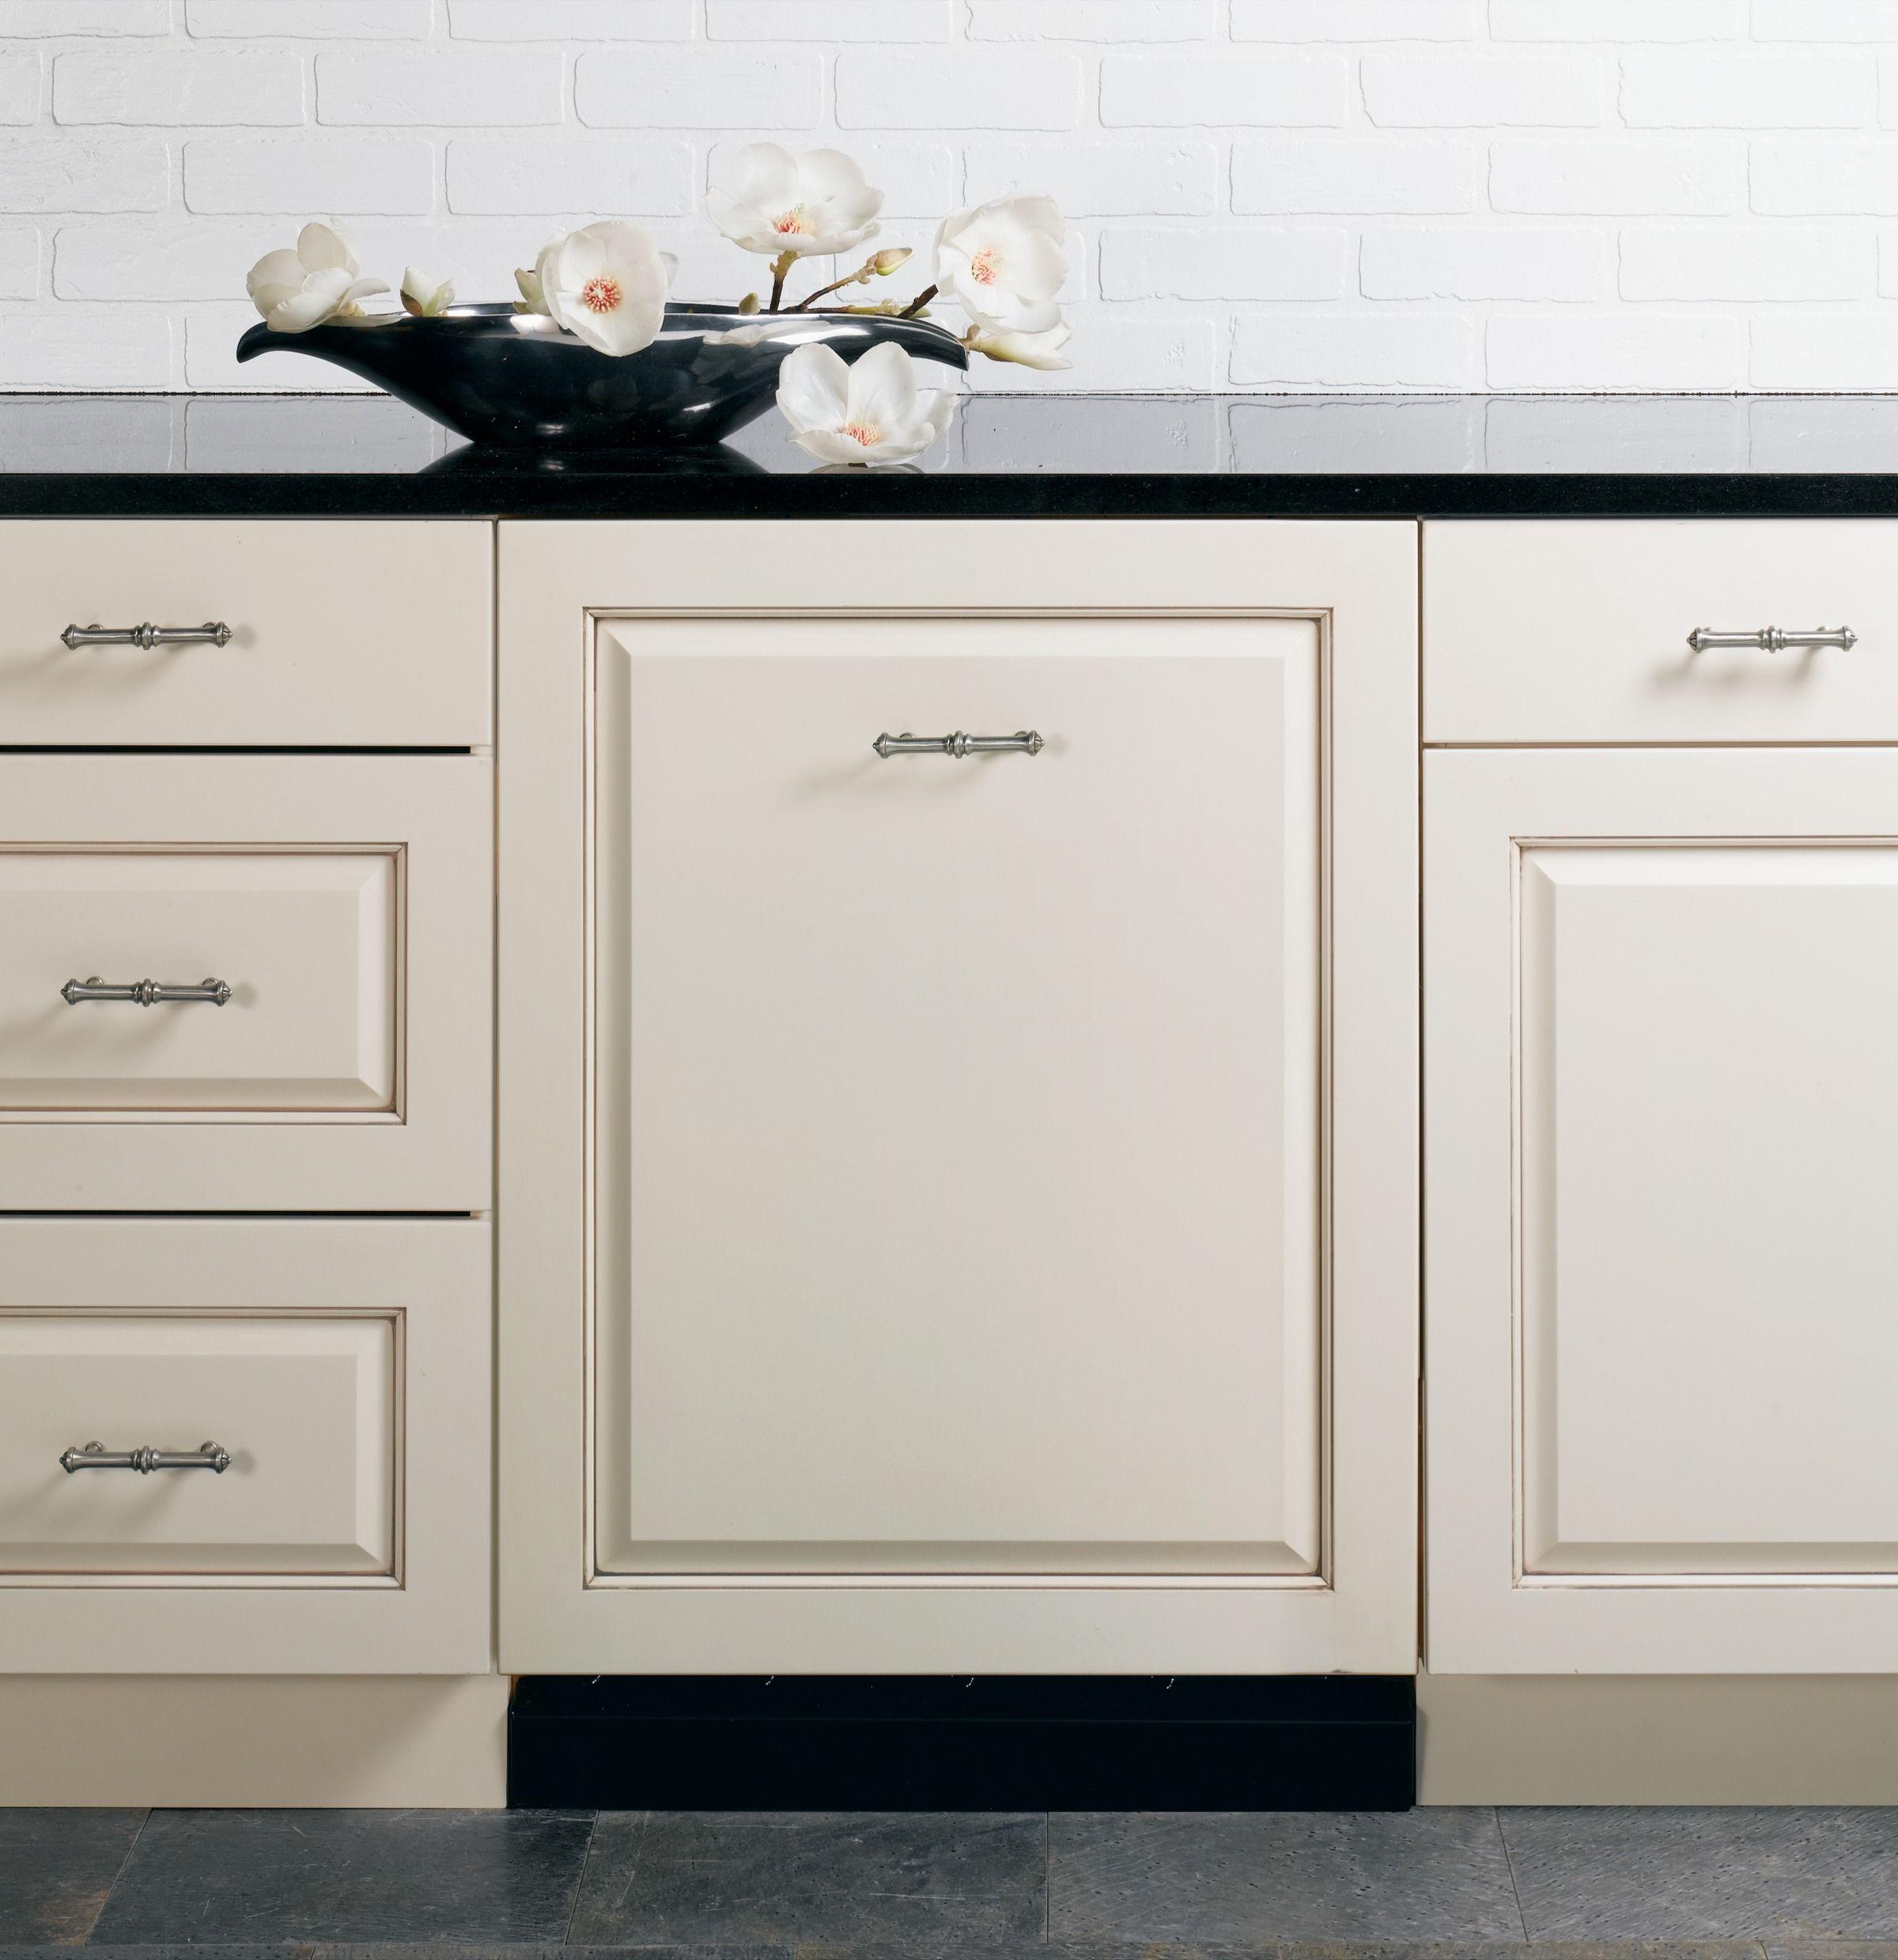 Ge Stainless Steel Interior Dishwasher With Hidden Controls Gdt740sifii Built In Dishwasher Steel Tub Ge Dishwasher